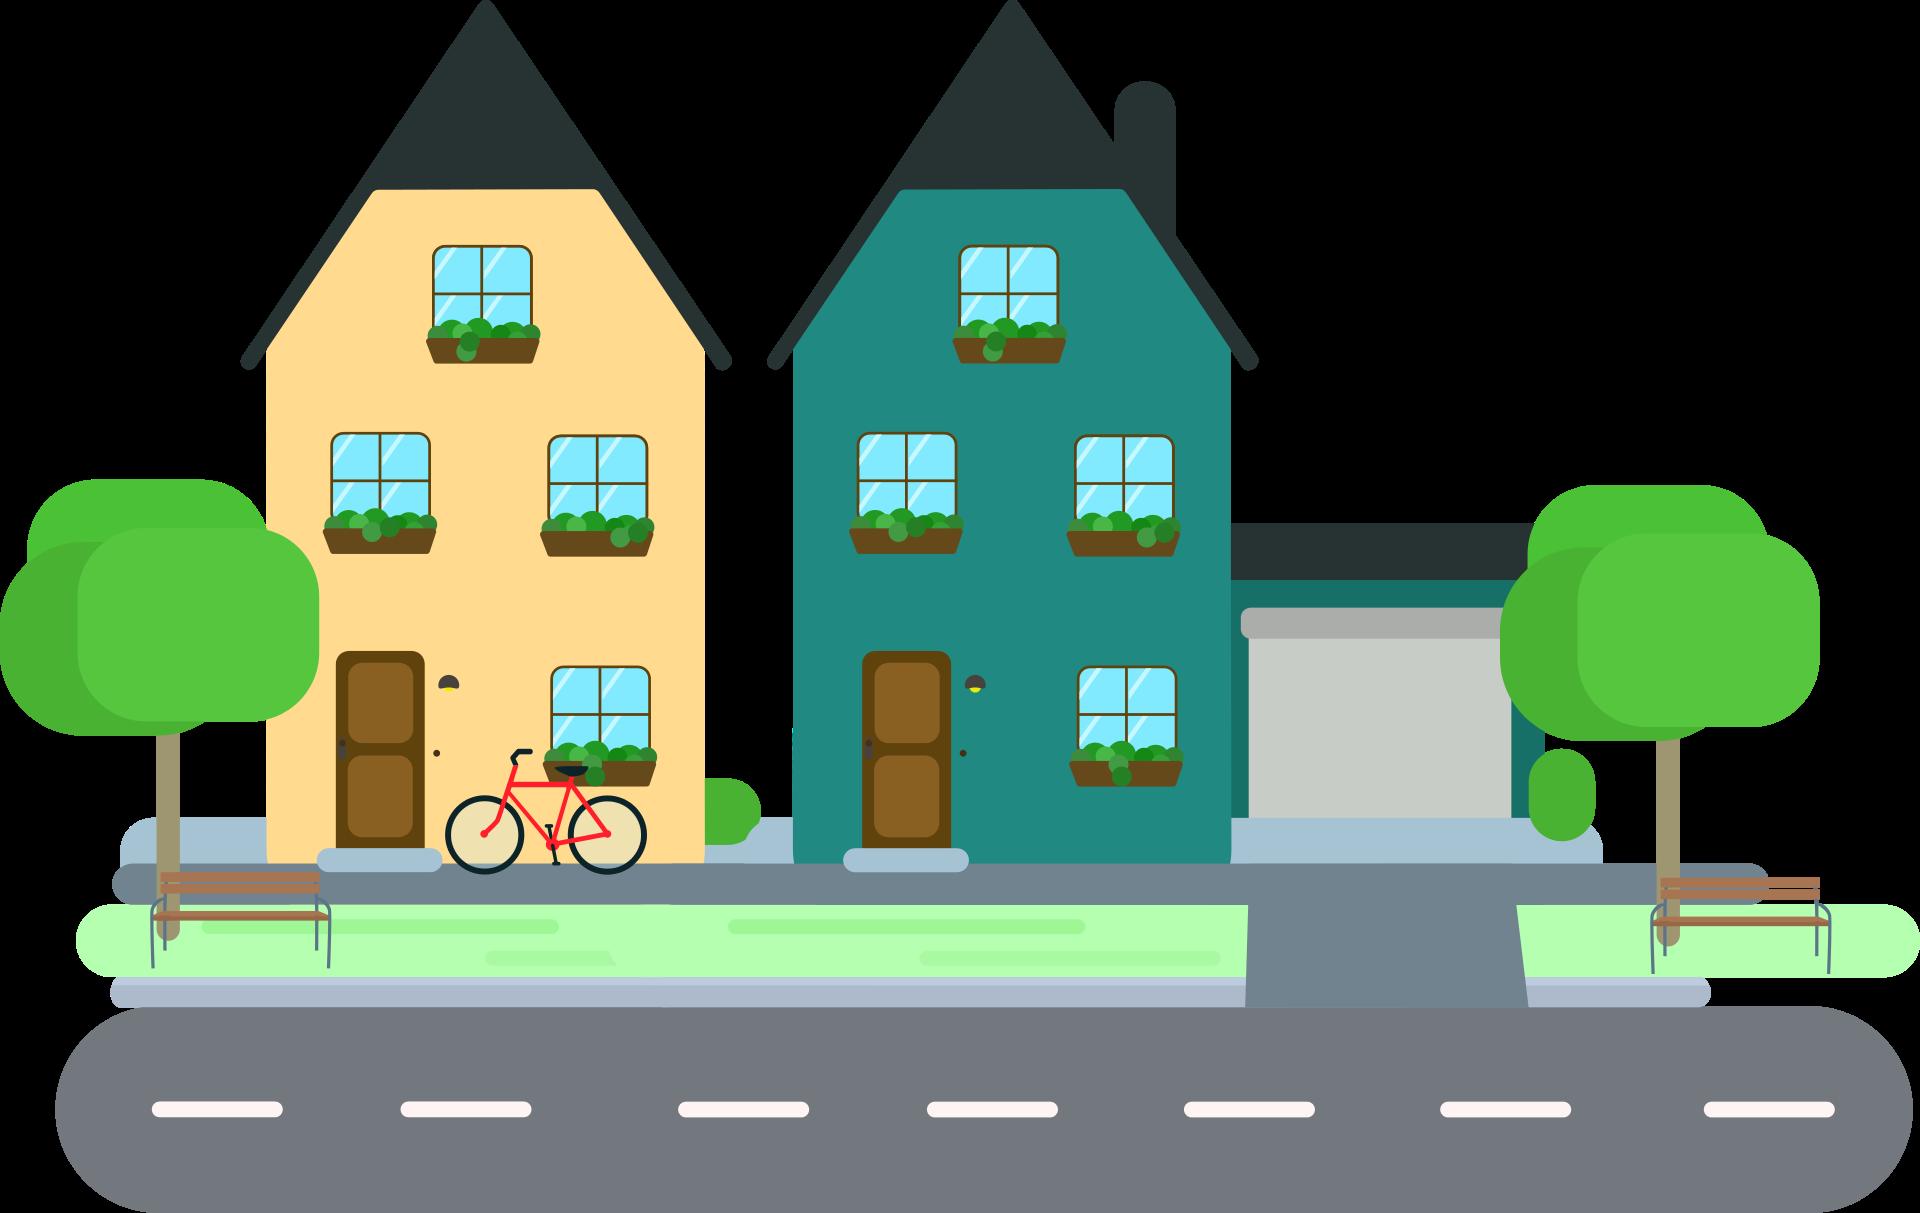 Neighborhood clipart country town. Sensational design house clip